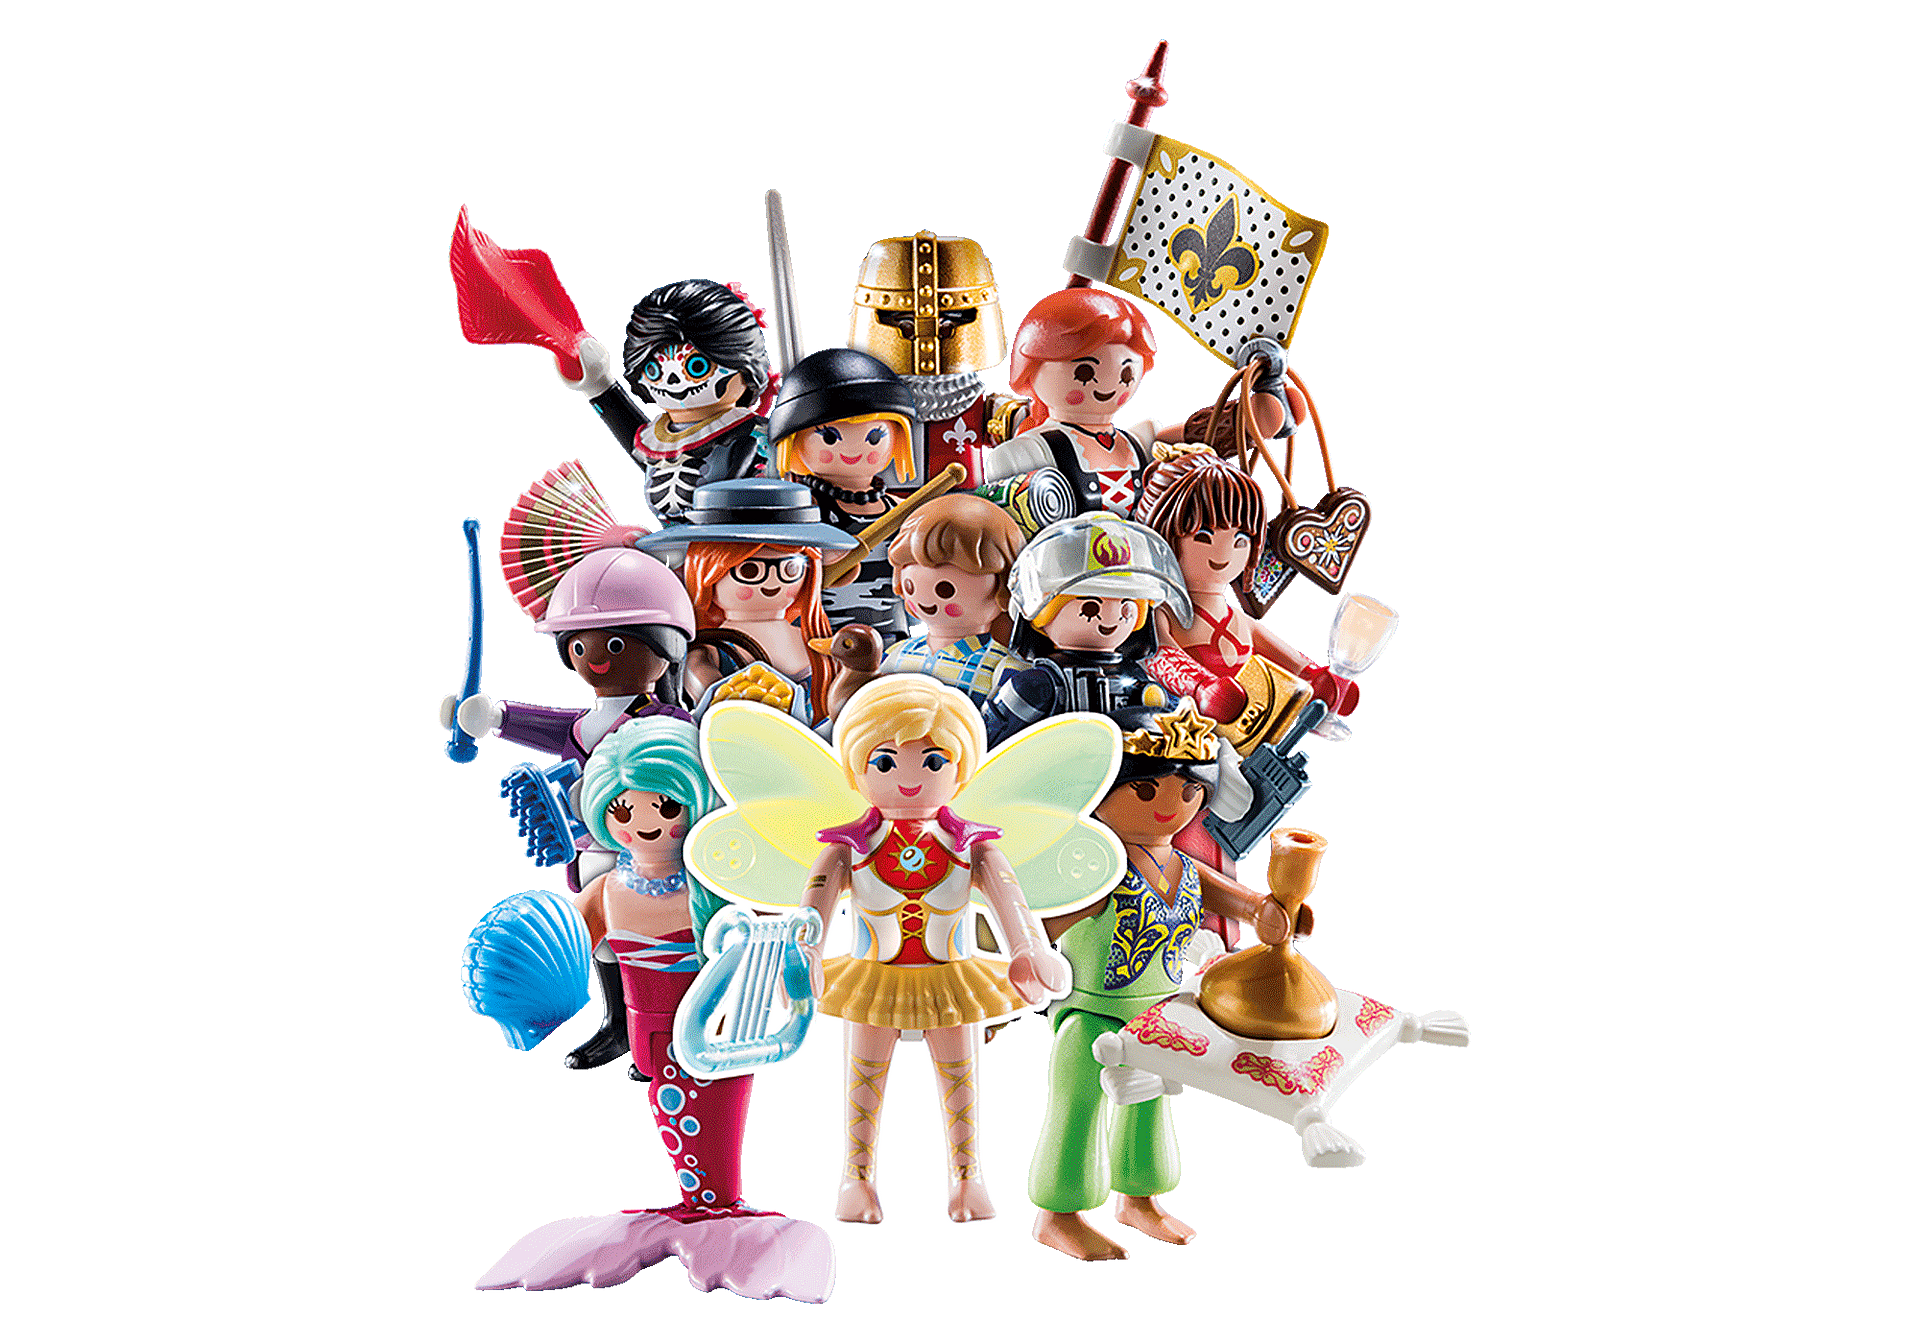 70149 PLAYMOBIL-Figures Girls (Serie 20) zoom image1